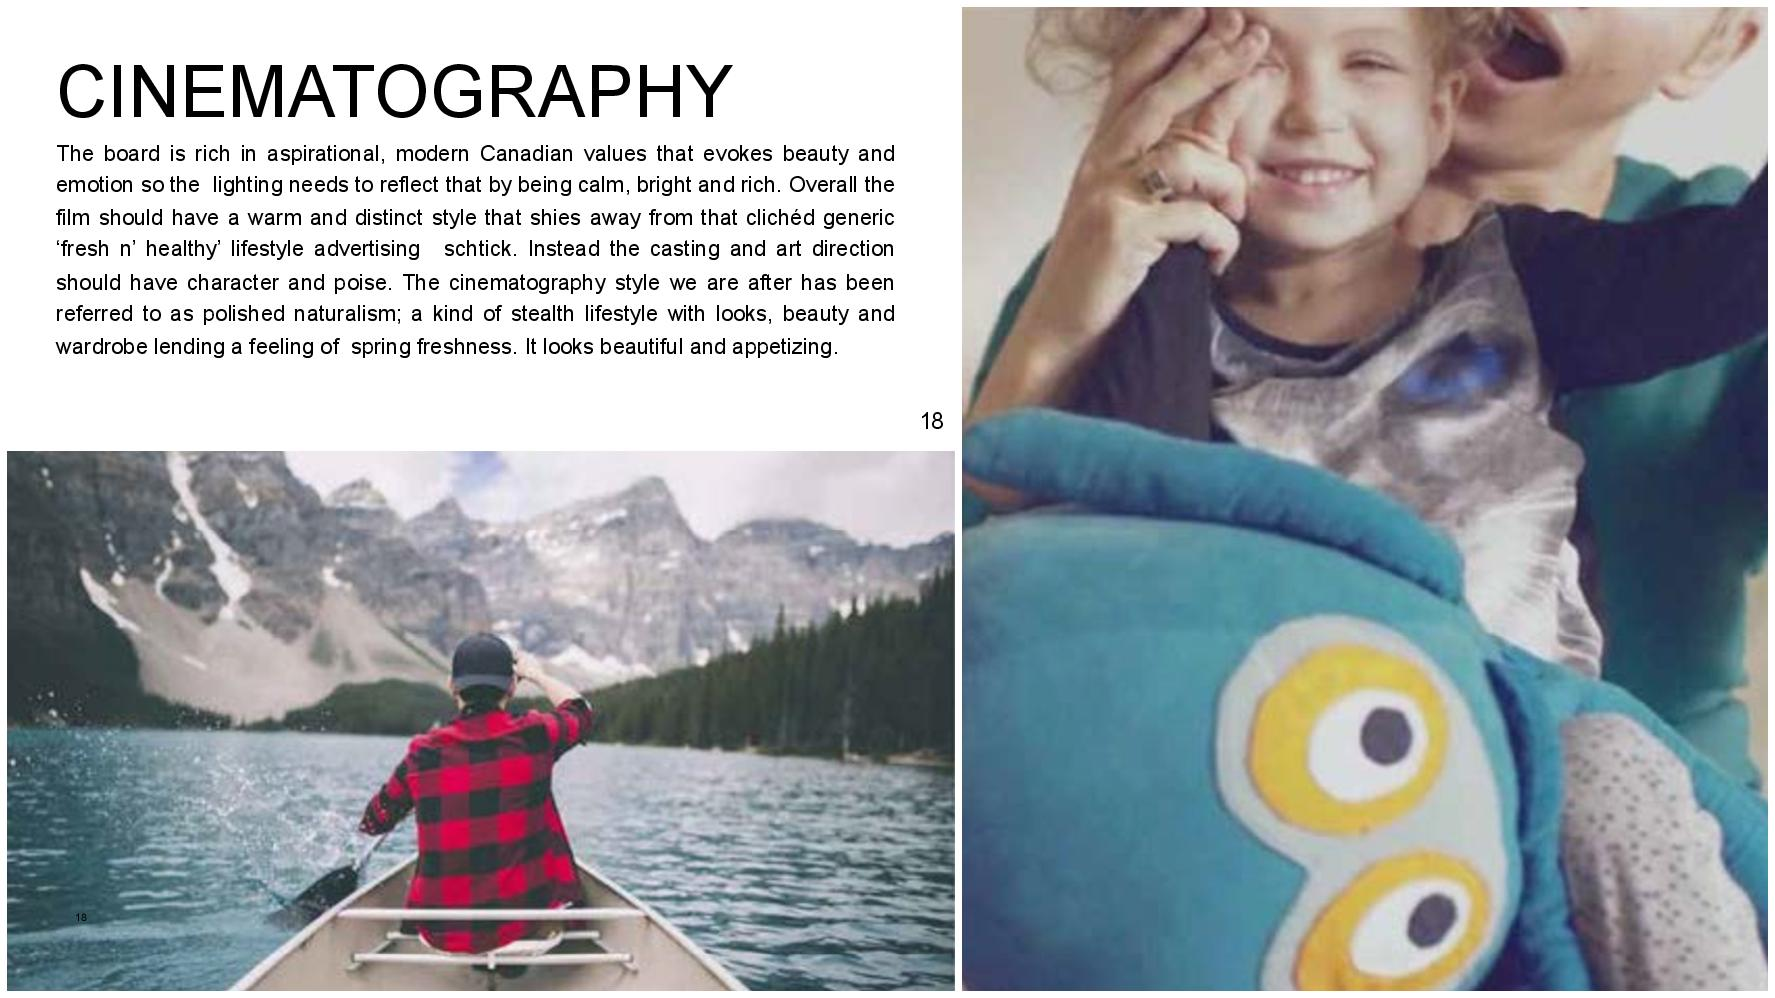 BECEL-page-018.jpg